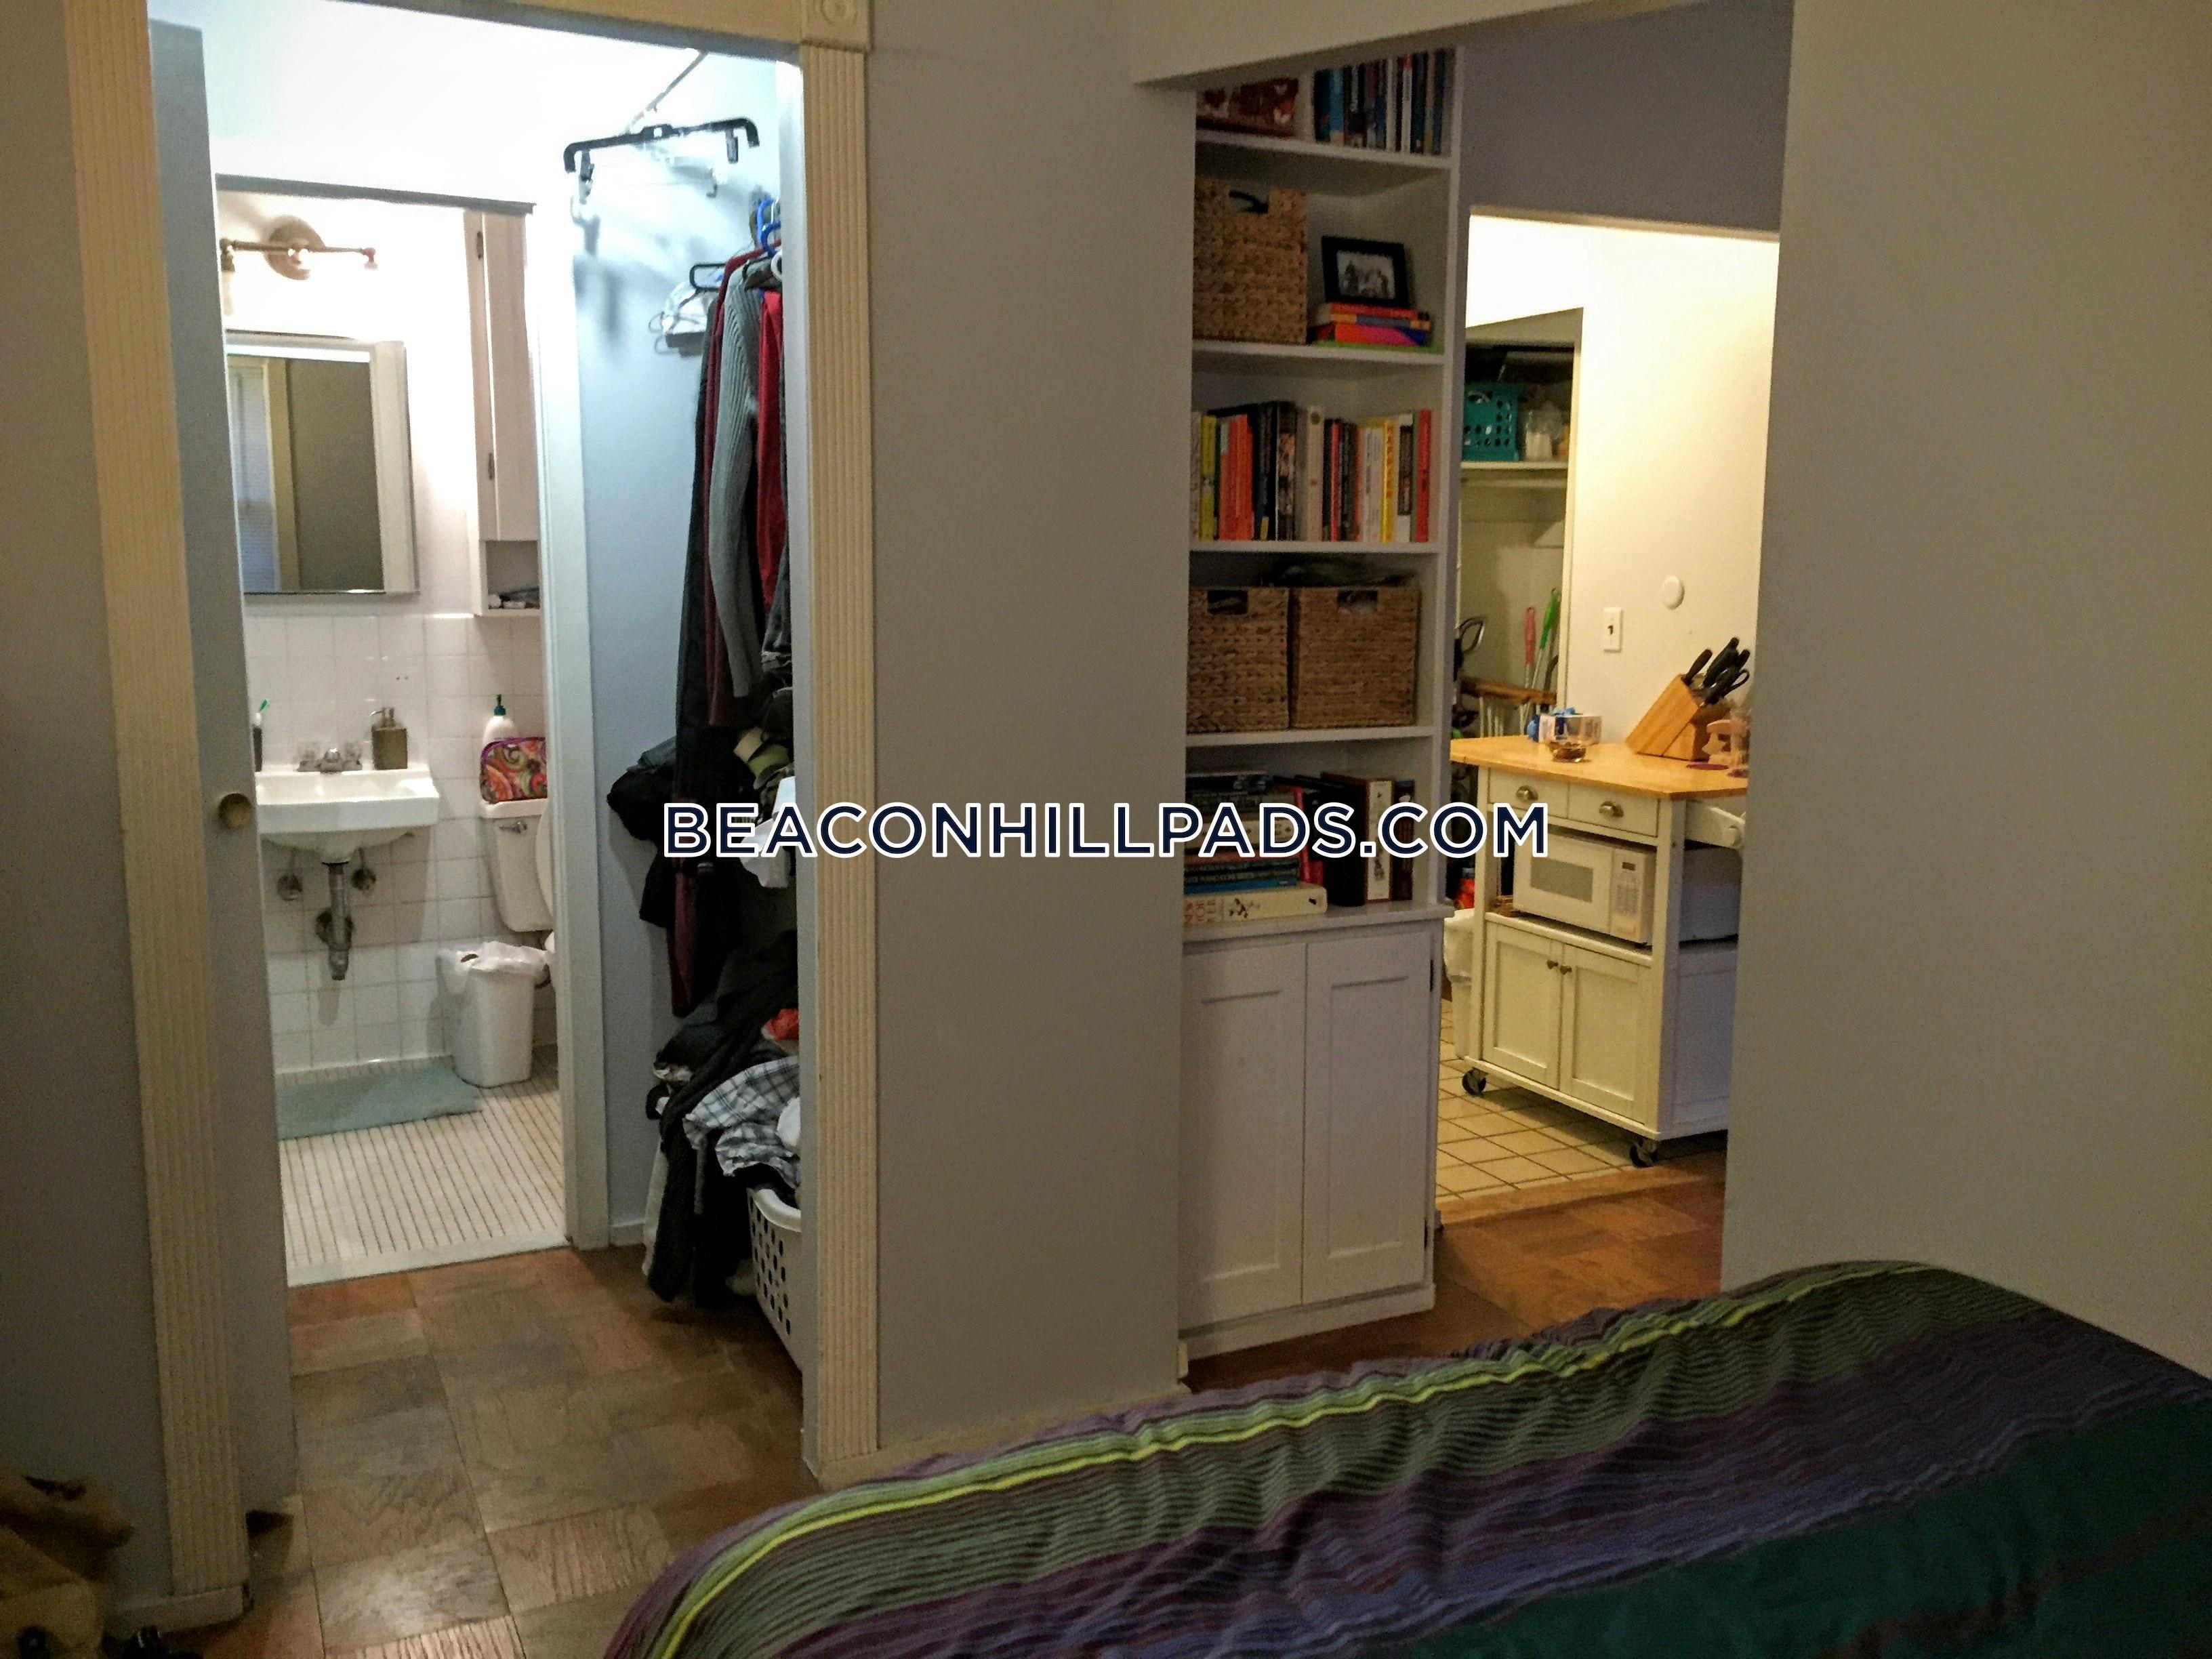 e Bedroom Apartments Boston Craigslist 1 bedroom apartment